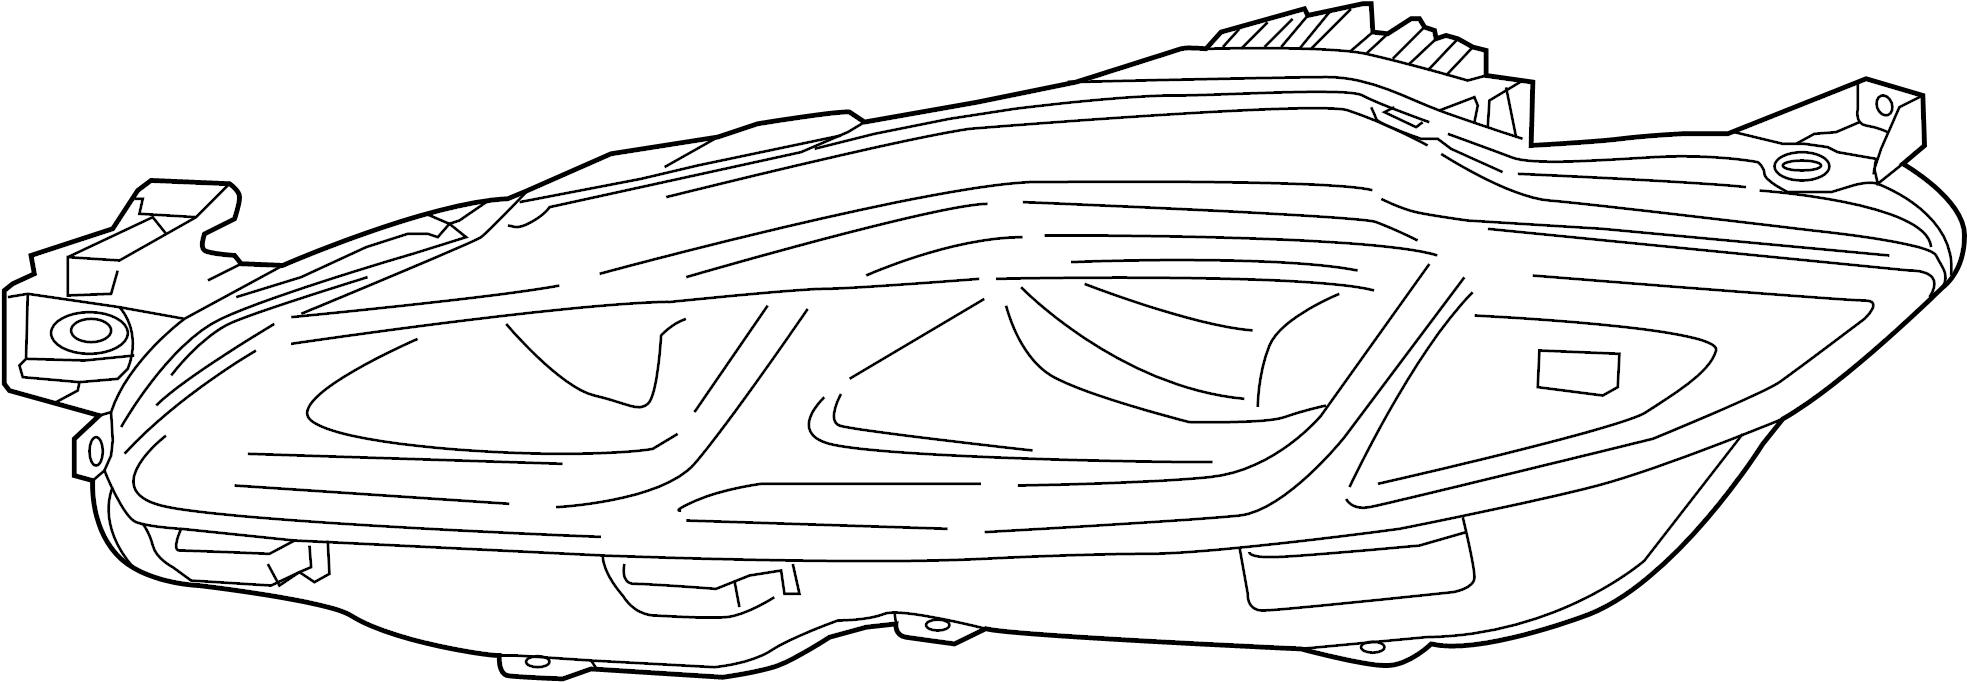 Jaguar XJ Headlamp ASSEMBLY. Headlight. 2016-18. Front